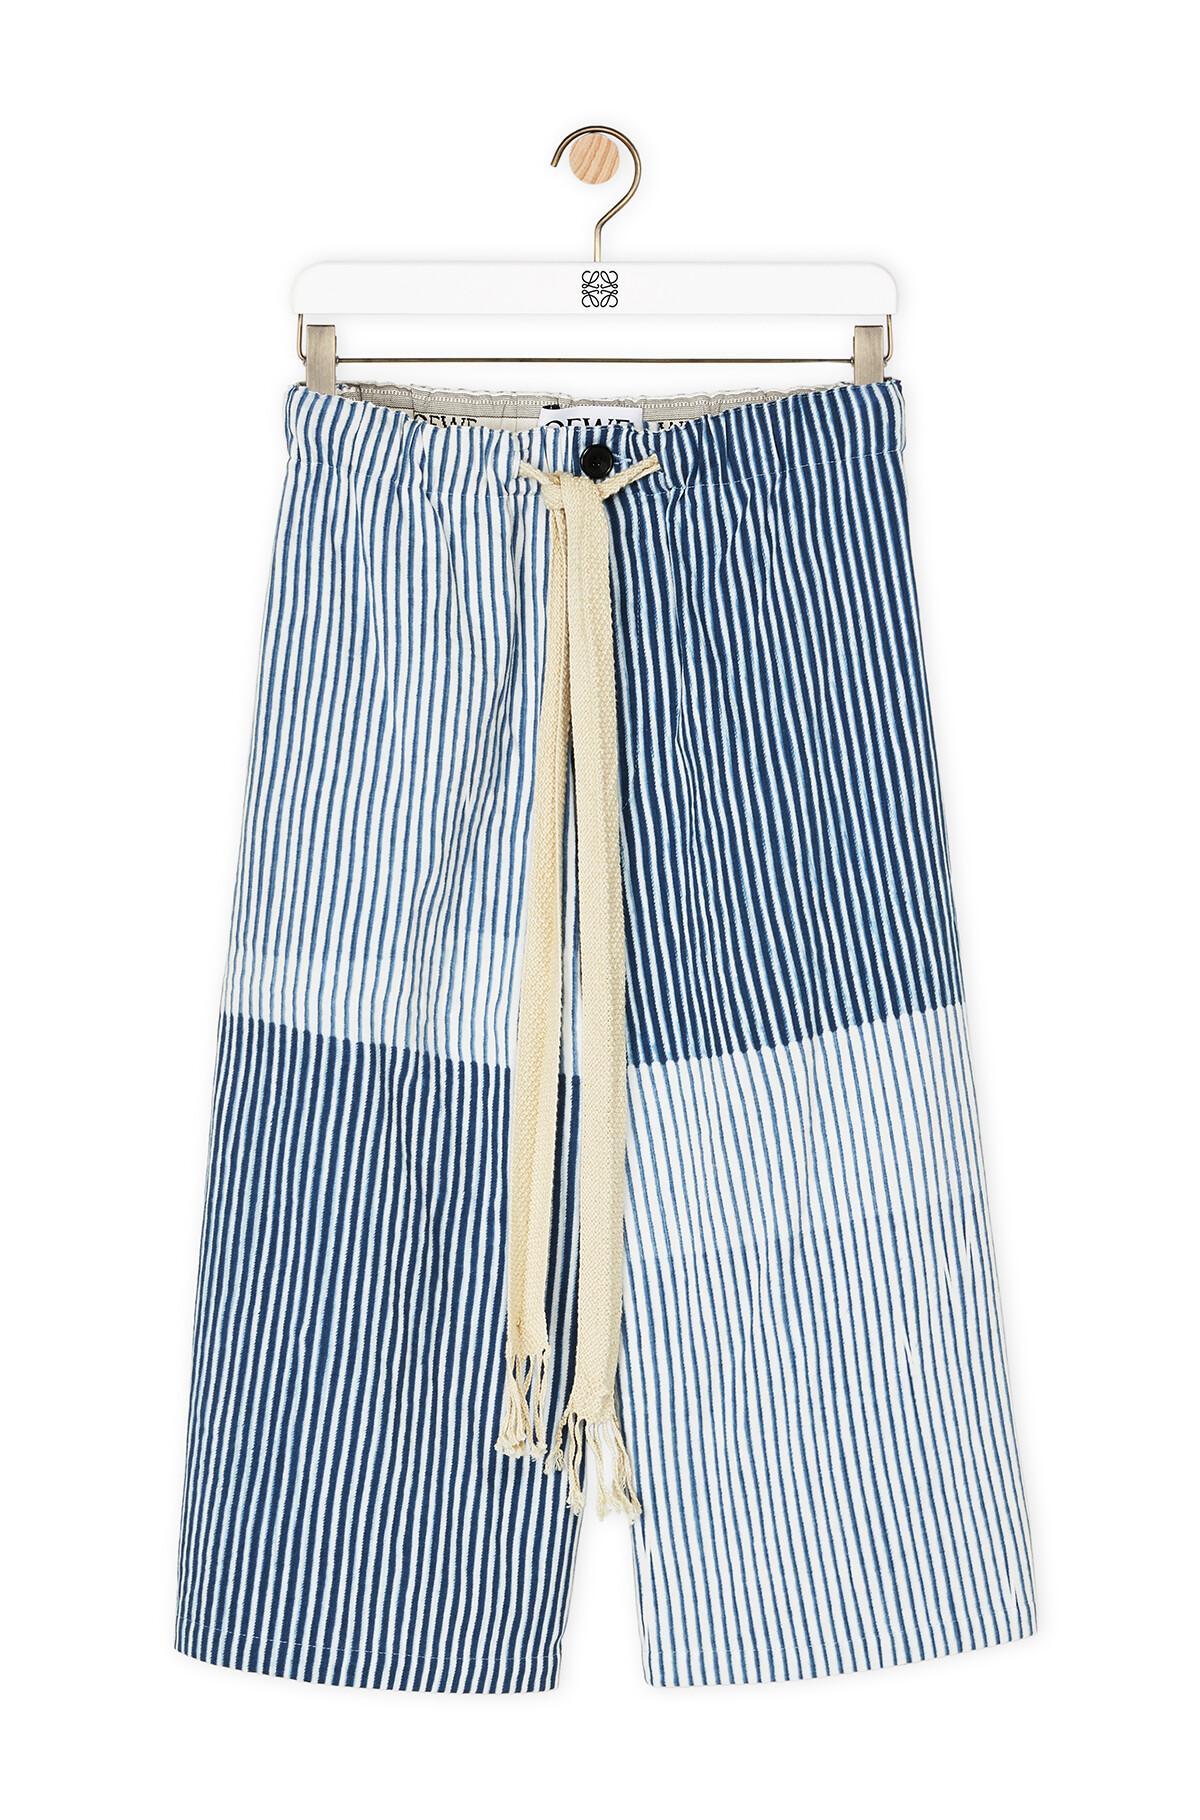 LOEWE Draw String Stripes  Bermuda white/blue front